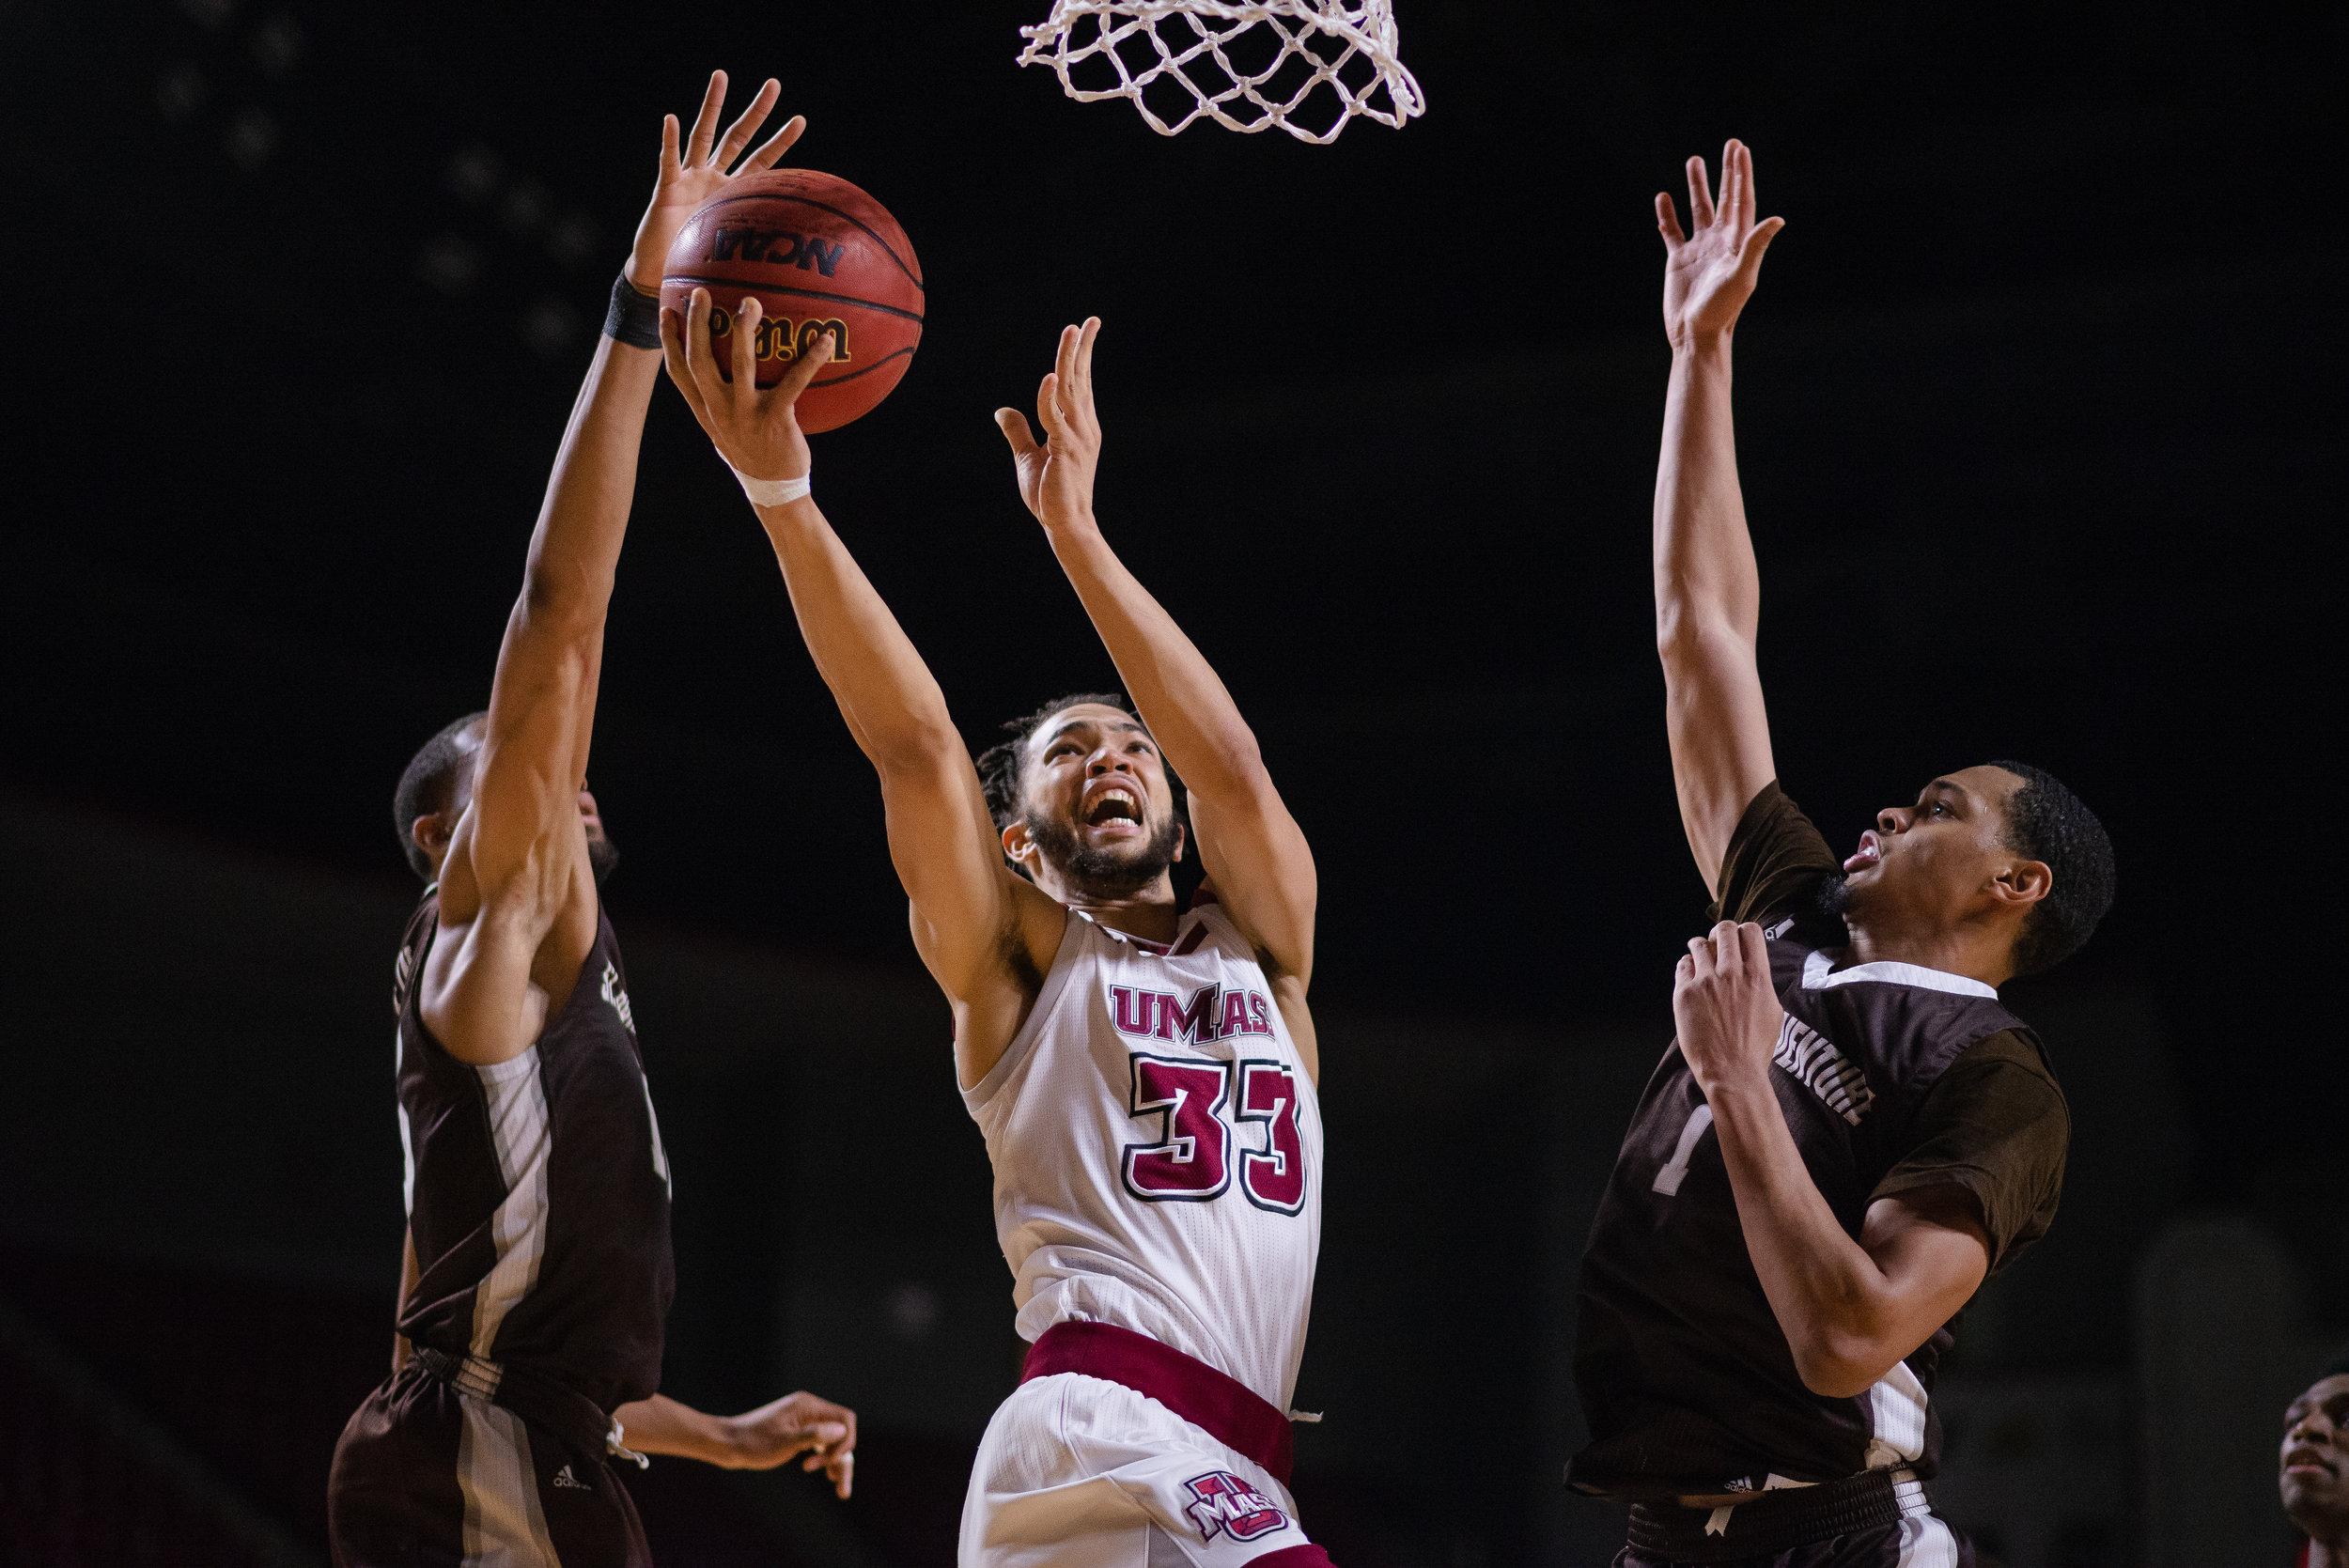 UMass Men's Basketball vs St. Bonaventure at the Mullins Center, Wed. Jan. 23, 2019.  (Photo by Judith Gibson-Okunieff)